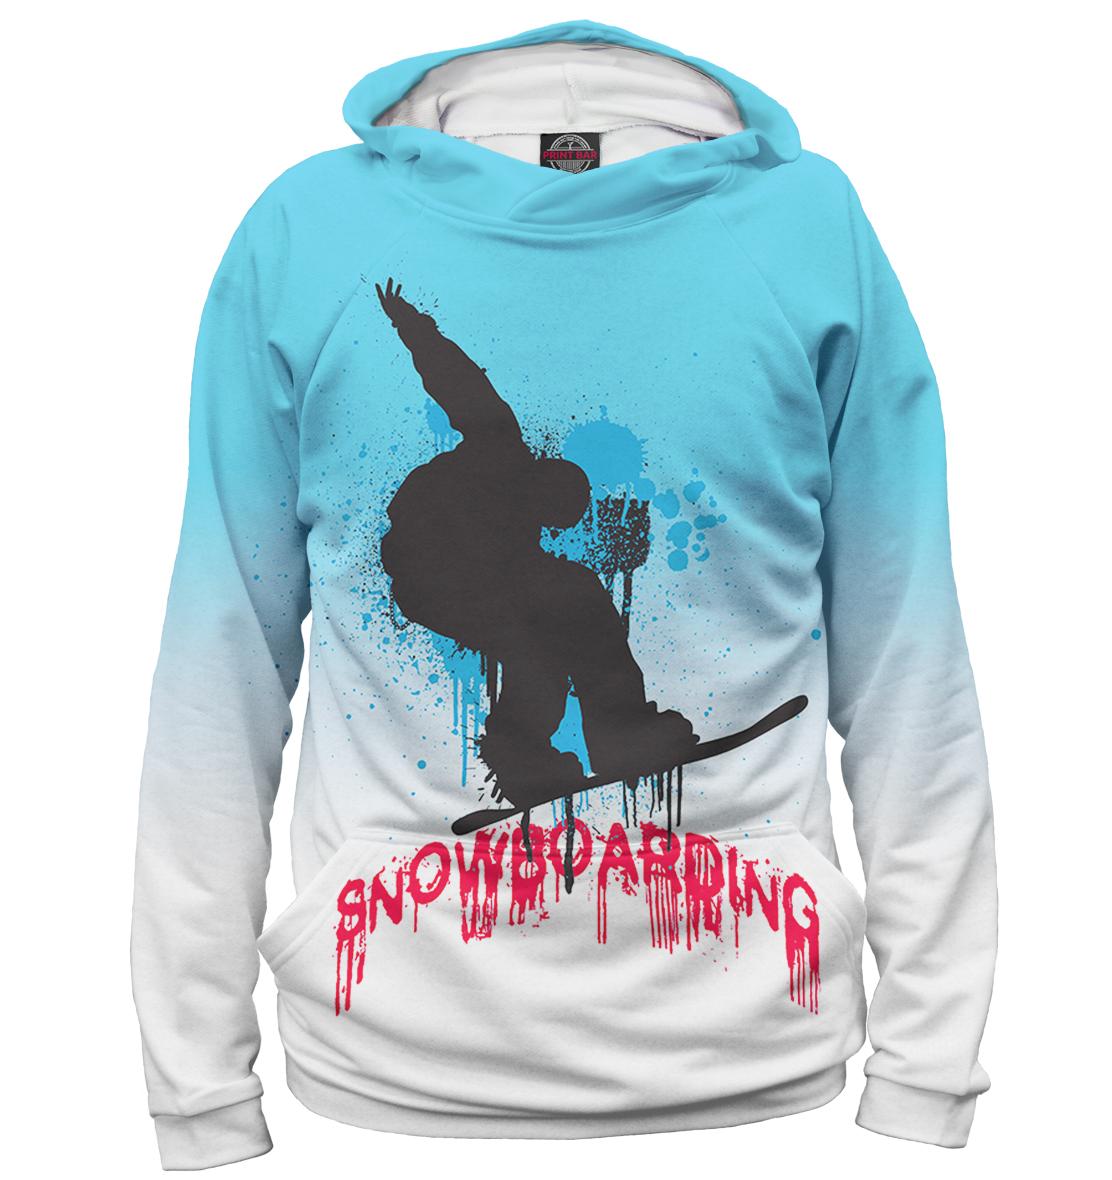 Купить Сноубординг, Printbar, Худи, SNW-874060-hud-1